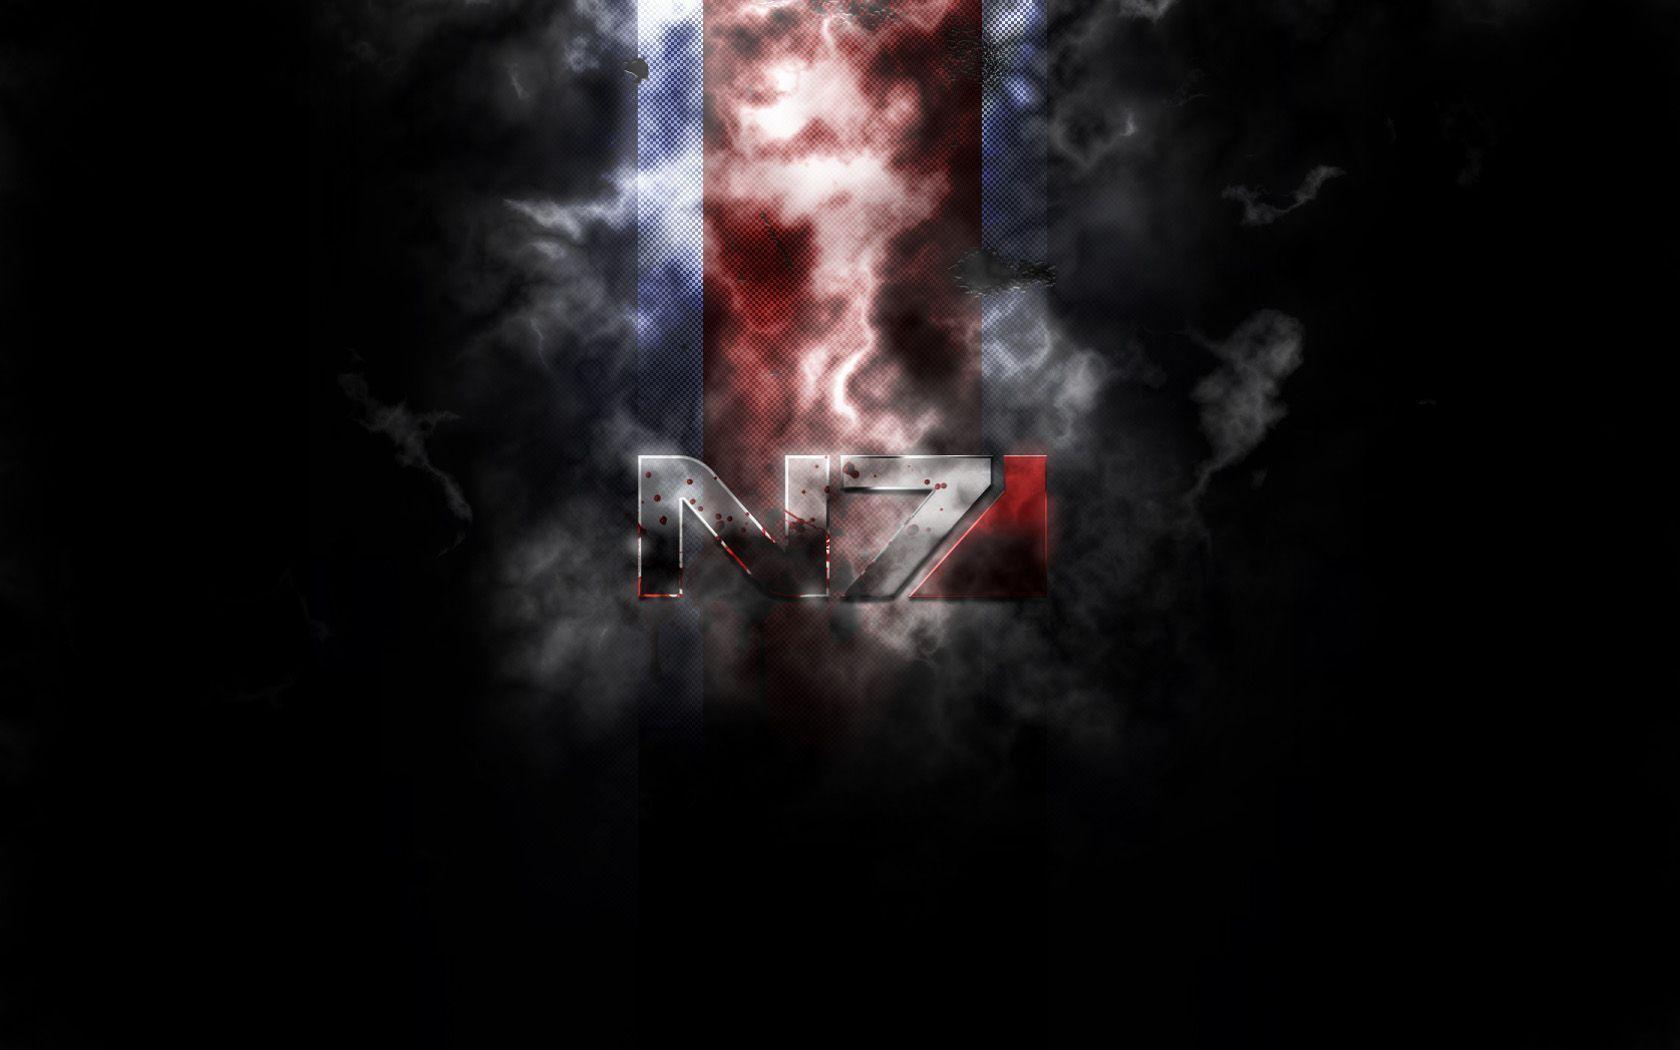 N7 Wallpapers - Wallpaper Cave